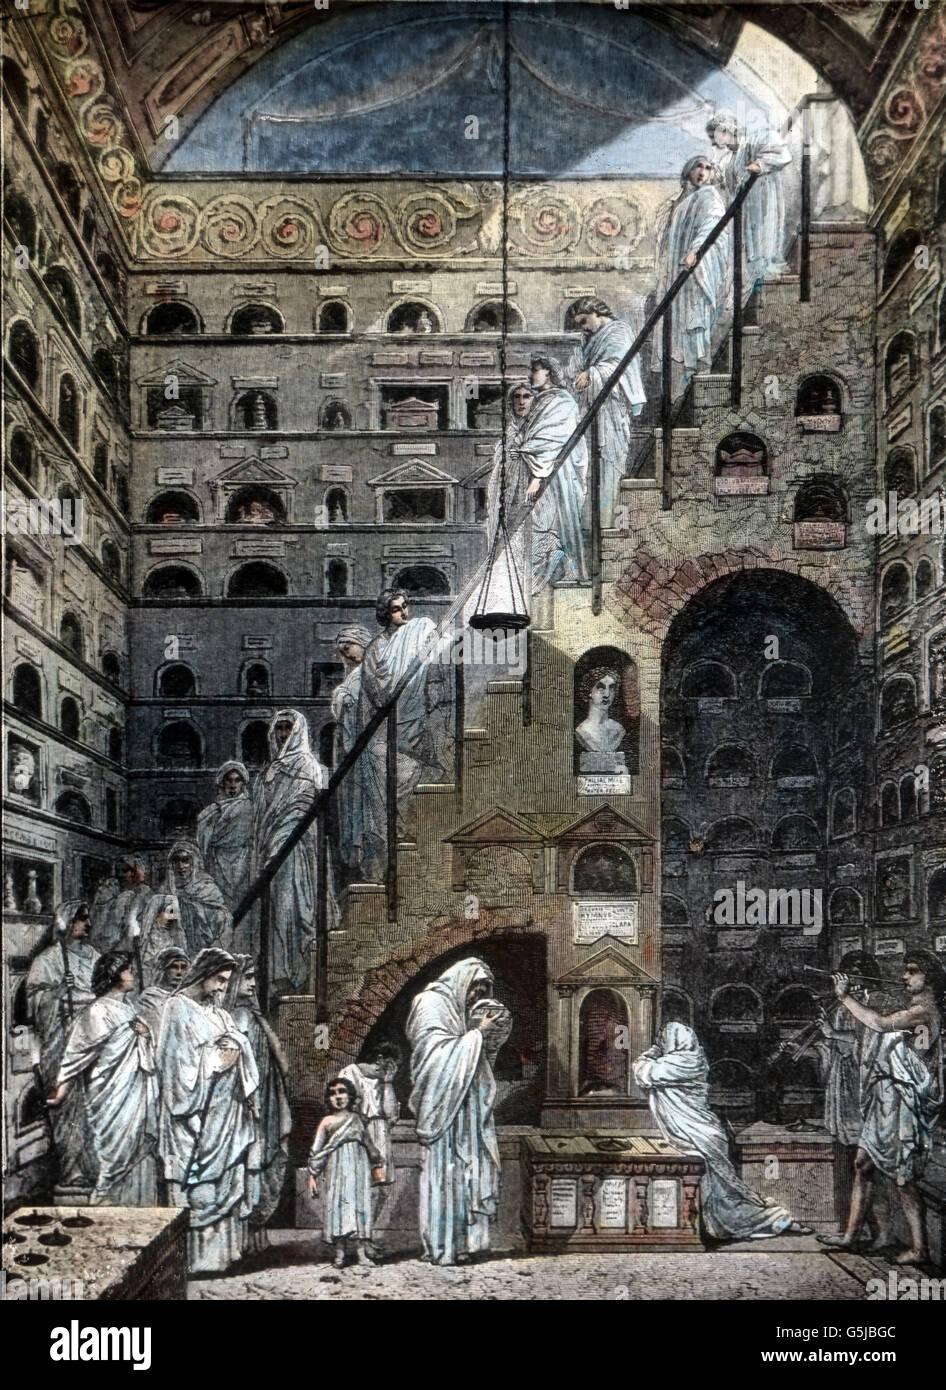 Ein römisches Columbarium un oberirdisches Gebäude zur Bestattung von Urnen. Un columbarium est un endroit paisible pour l'entreposage des urnes. Banque D'Images